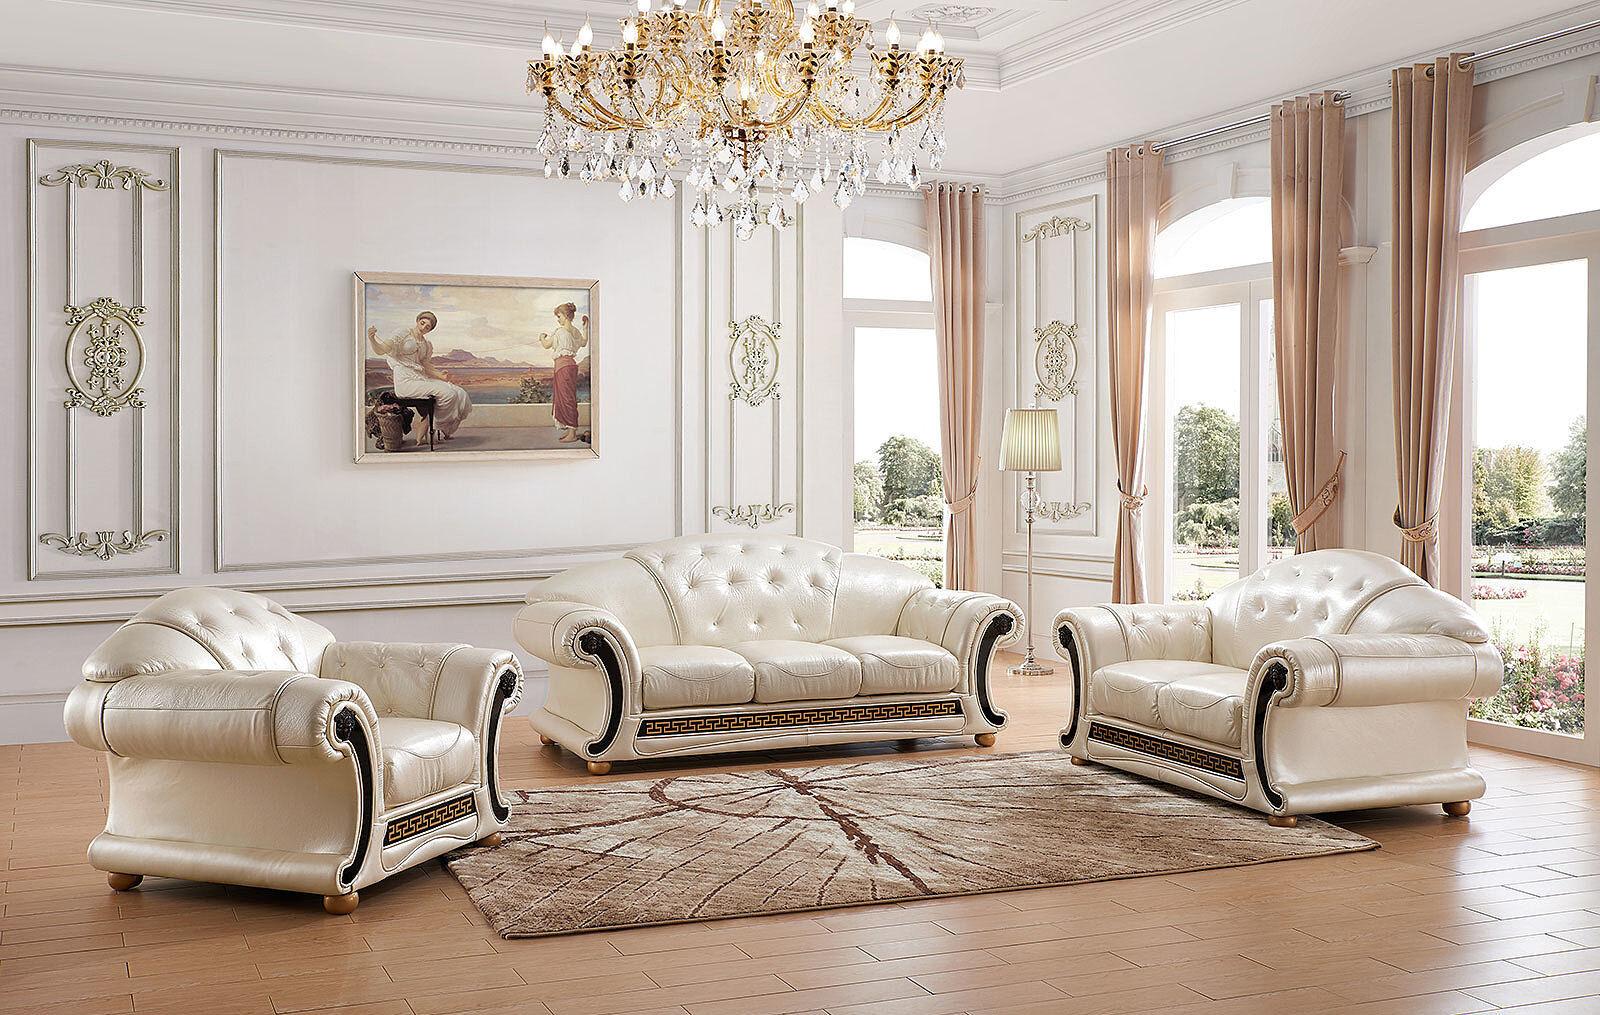 ESF Furniture Apolo Sofa Loveseat Chair Pearl Italian Leather Living Room, 3 Pcs